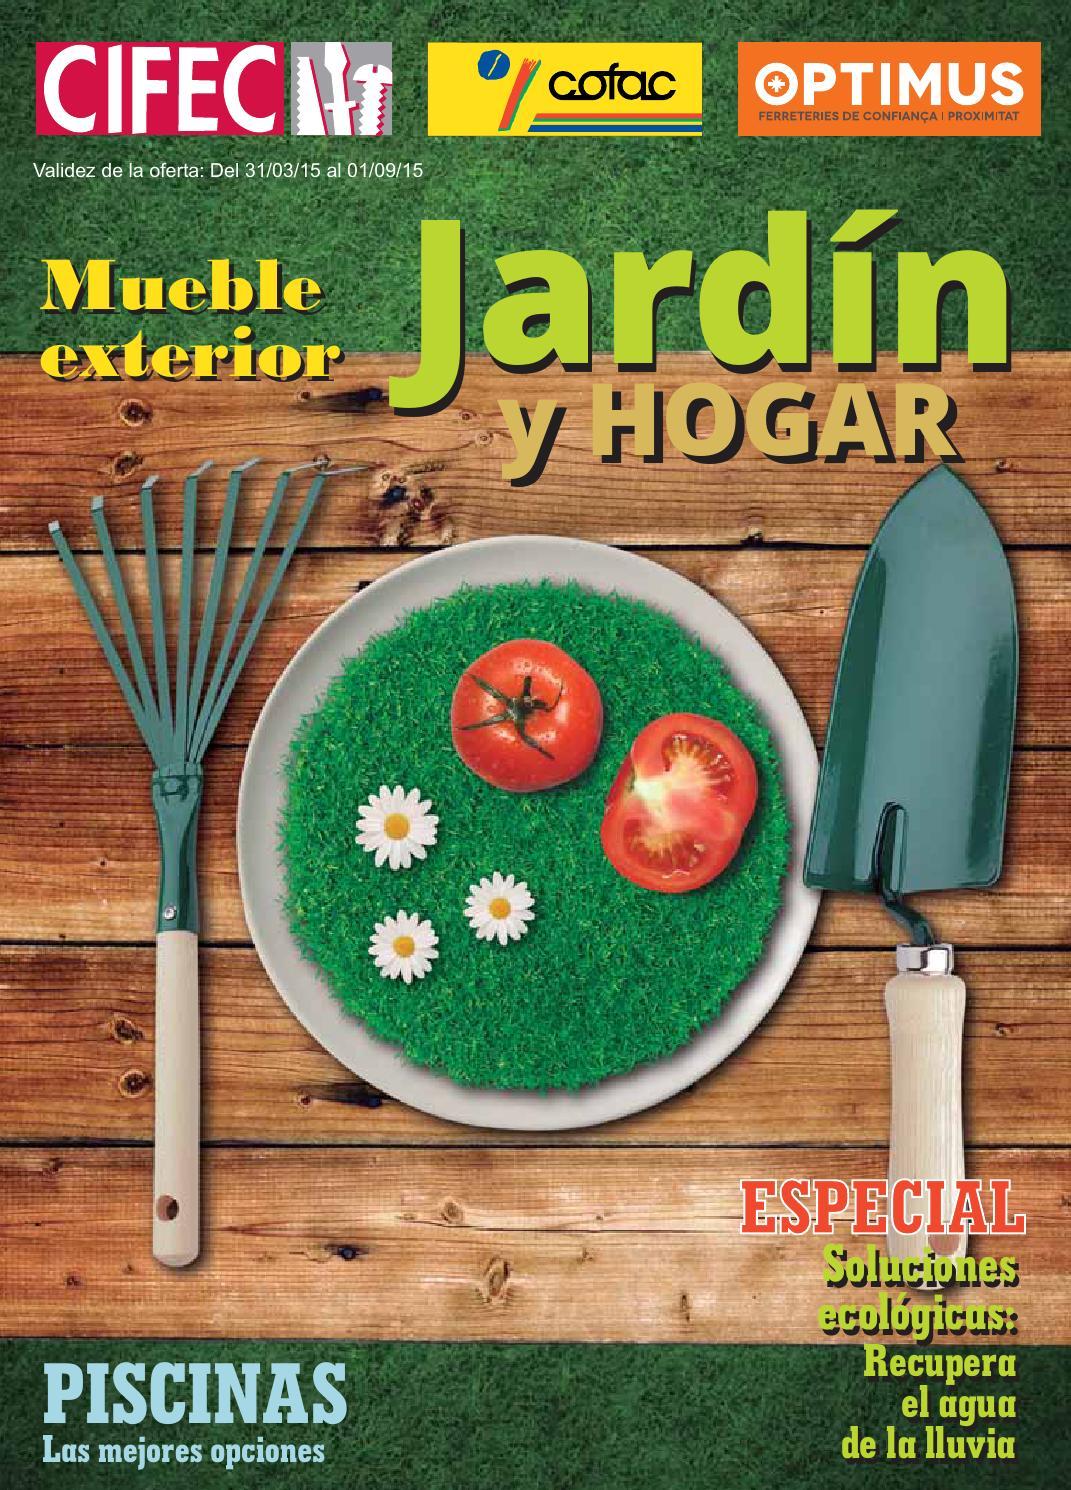 catalogo jardineria 2015 cofac ferreteria diaz by cofedisa